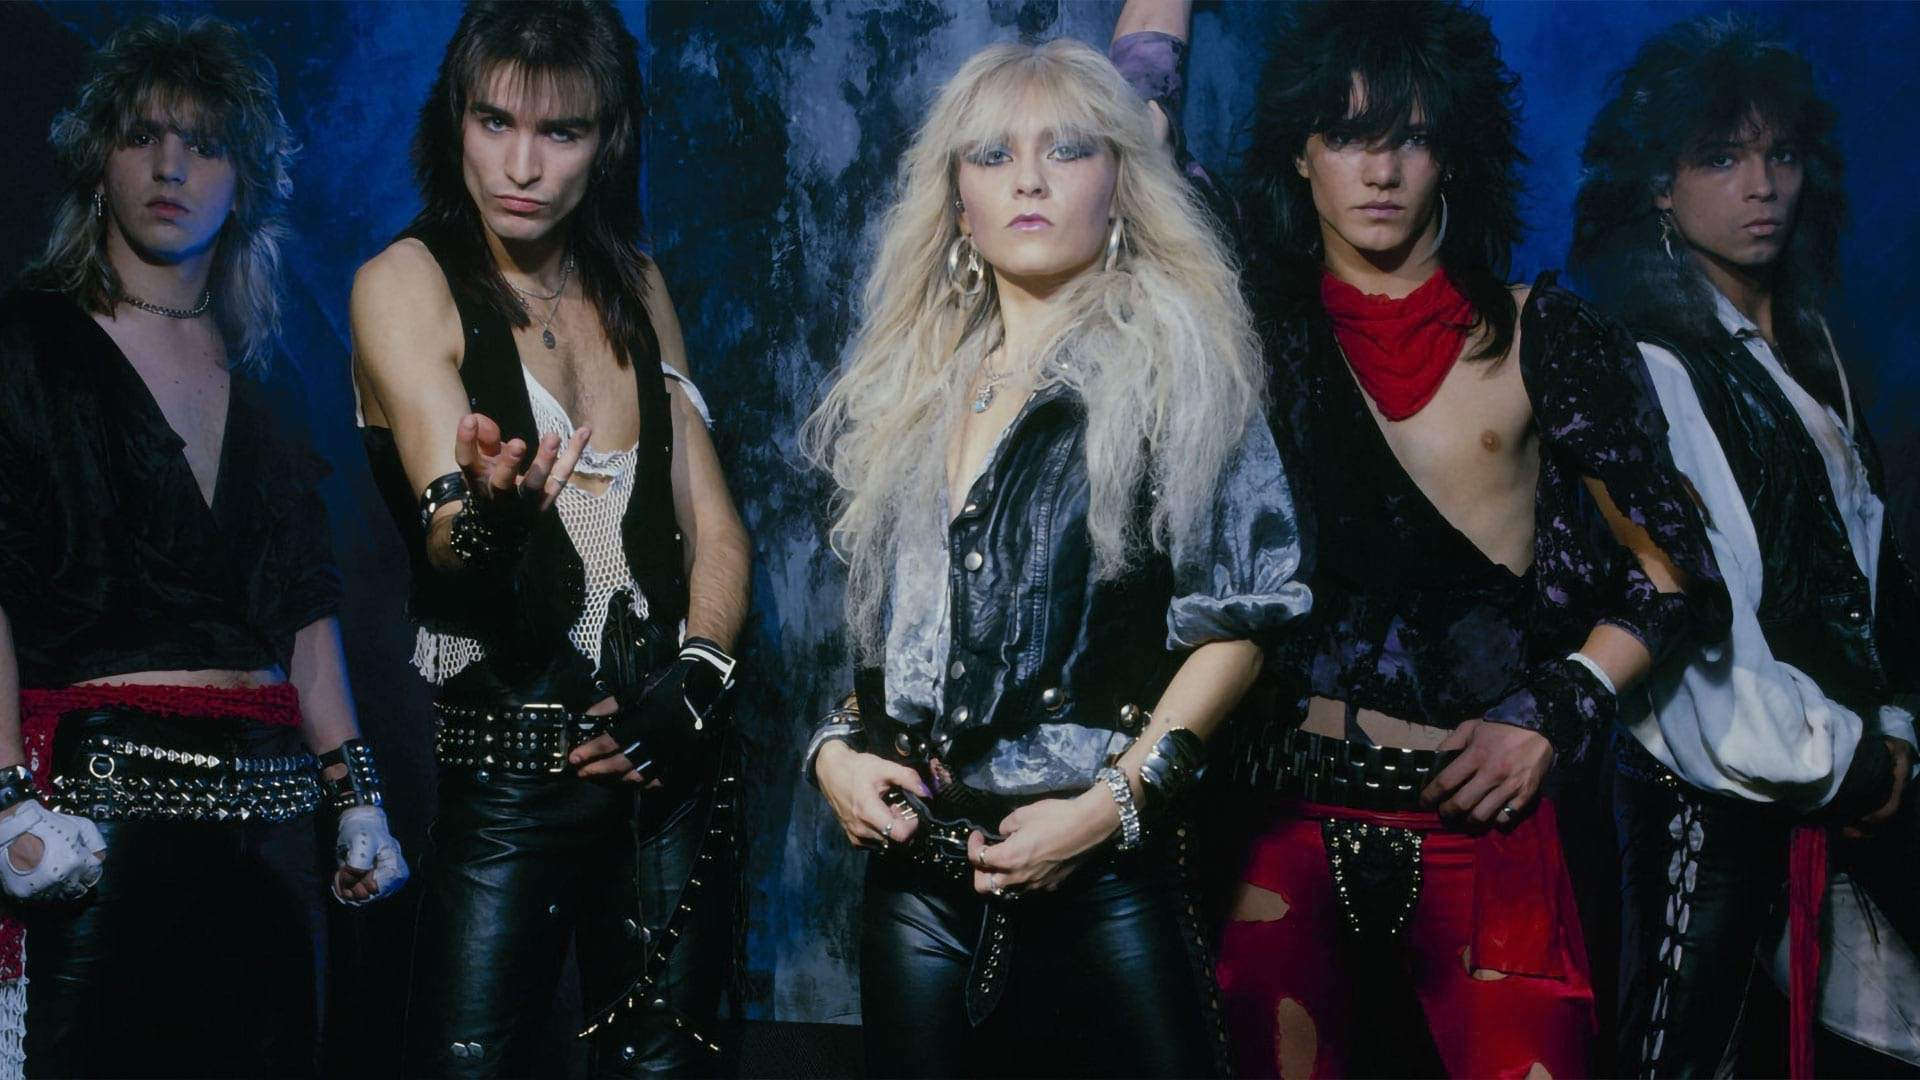 warlock-band-1985-190923_1920x.jpg